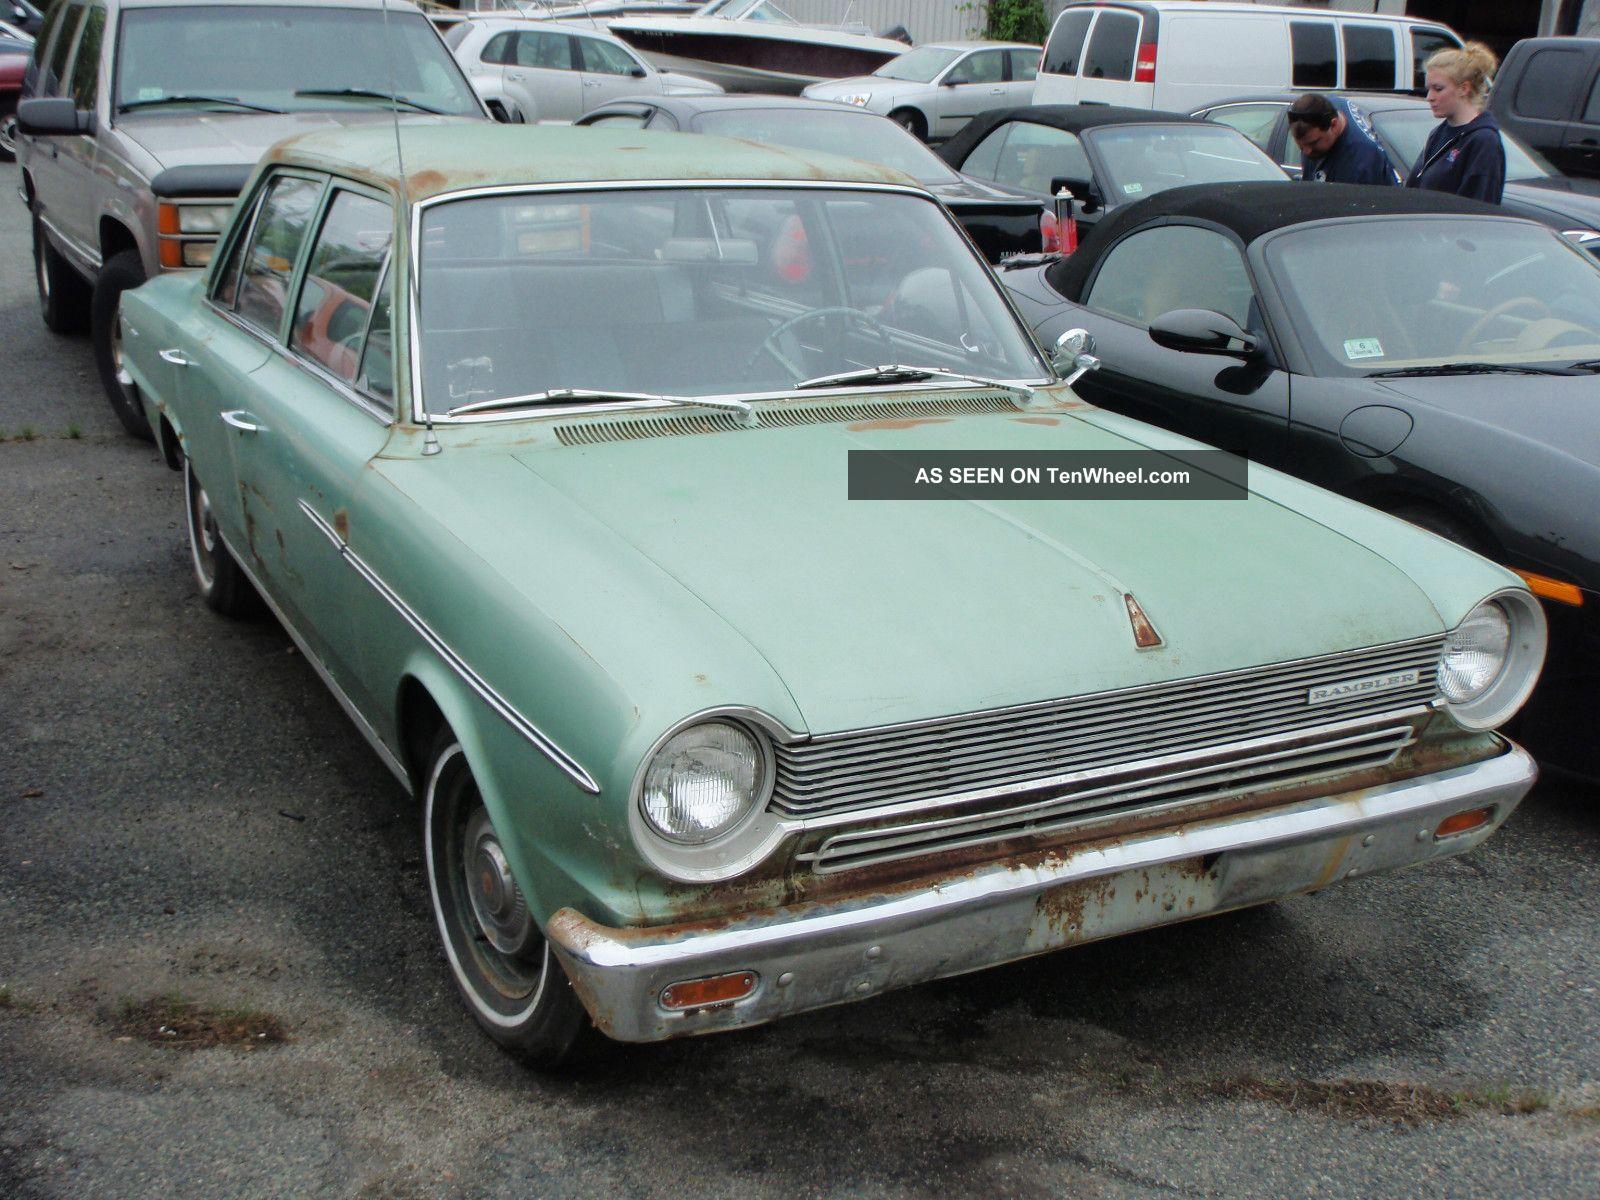 1964 Amc Rambler Sedan Solid Body Barn Find Solid Restorable Car AMC photo